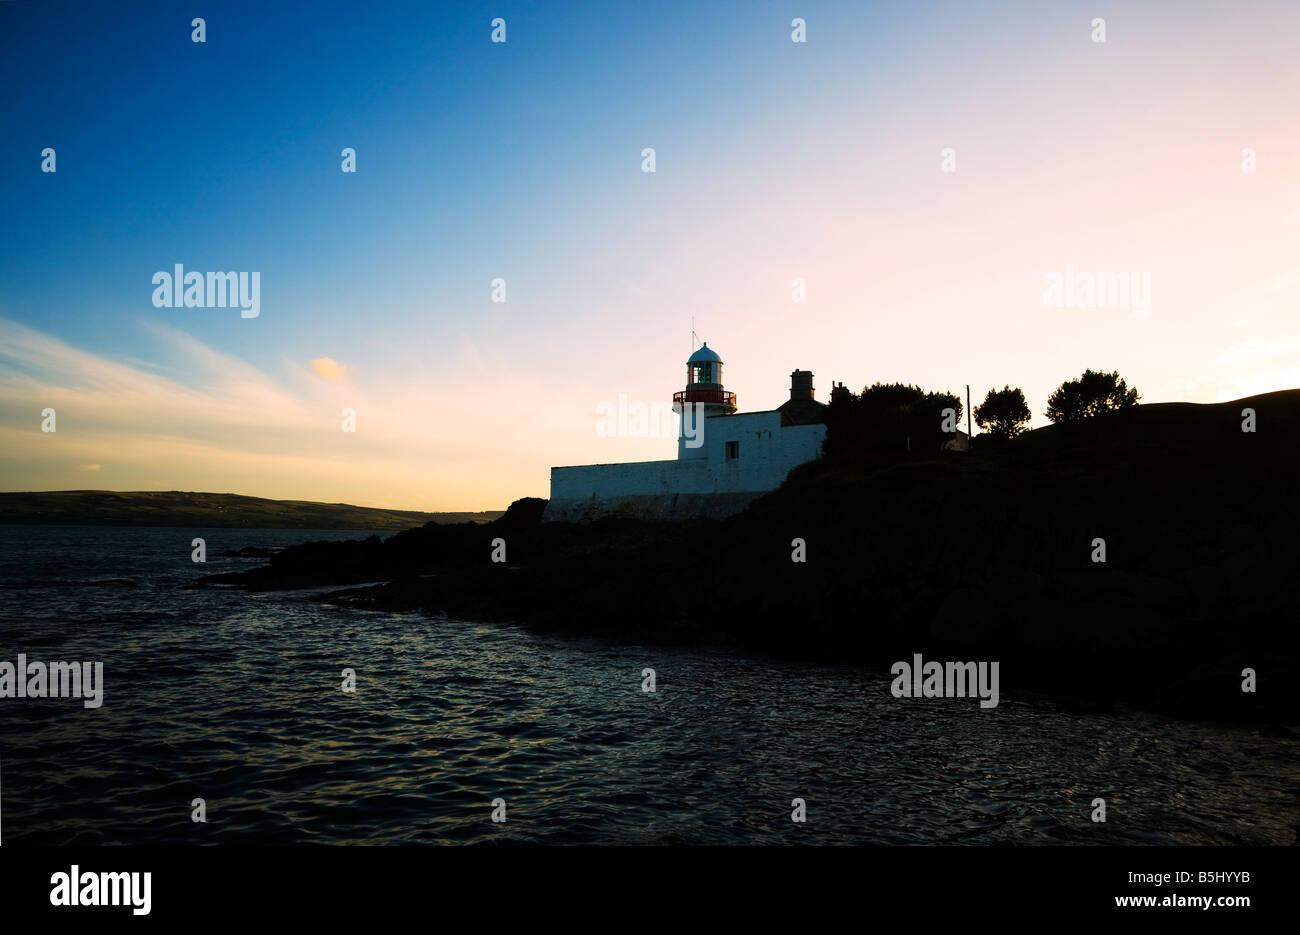 Ballynacourty Lighthouse, Near Dungarvan, County Waterford, Ireland Stock Photo